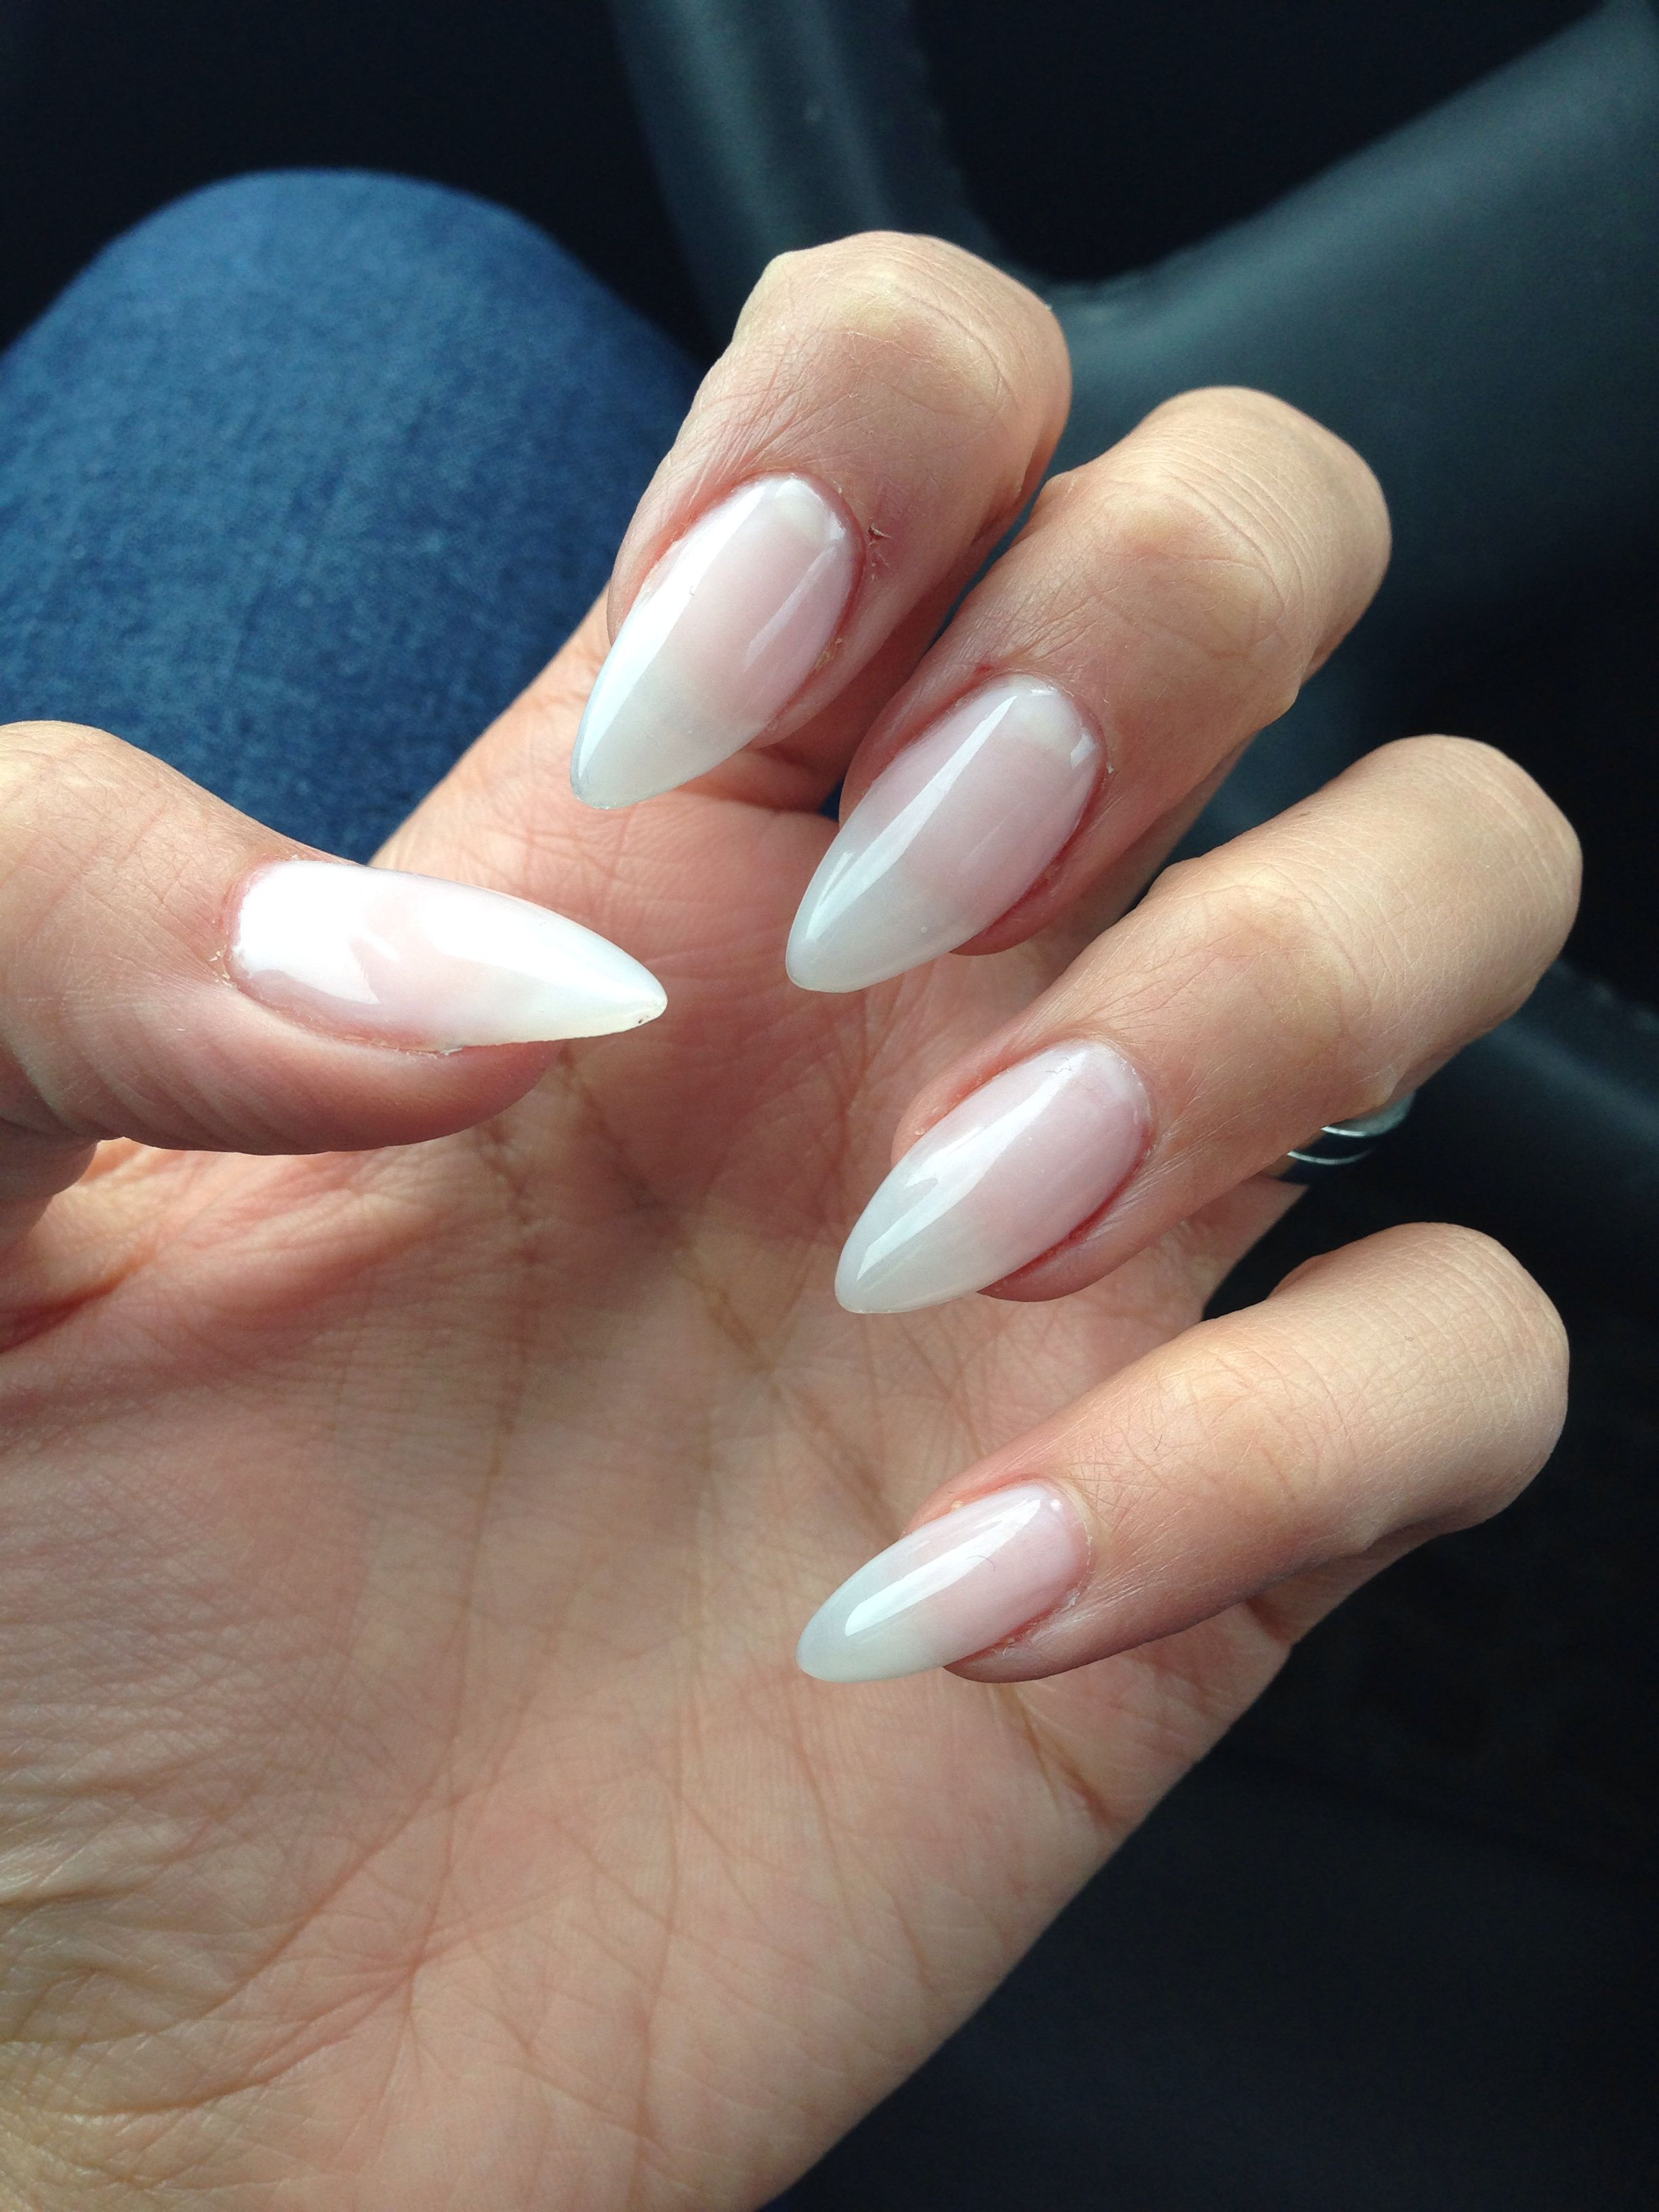 natural looking gel almond nails nails pinterest nagelschere geln gel und nageldesign. Black Bedroom Furniture Sets. Home Design Ideas